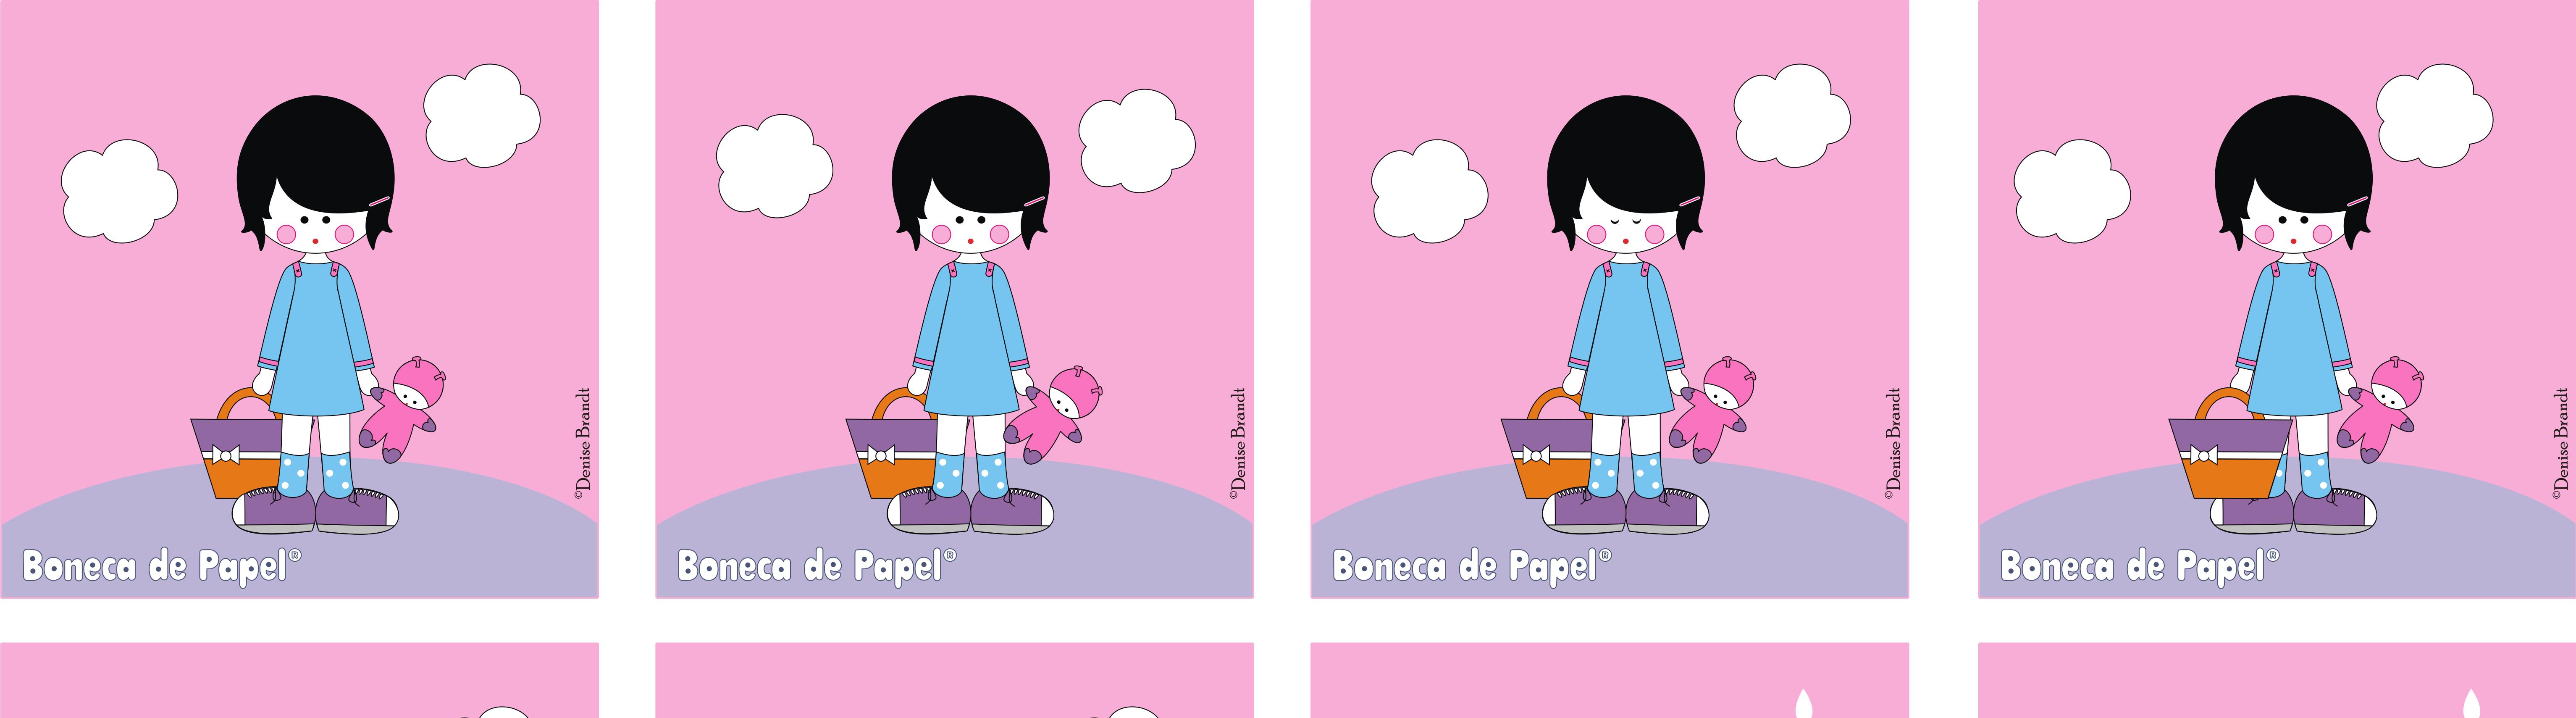 Animacao 1 boneca 1